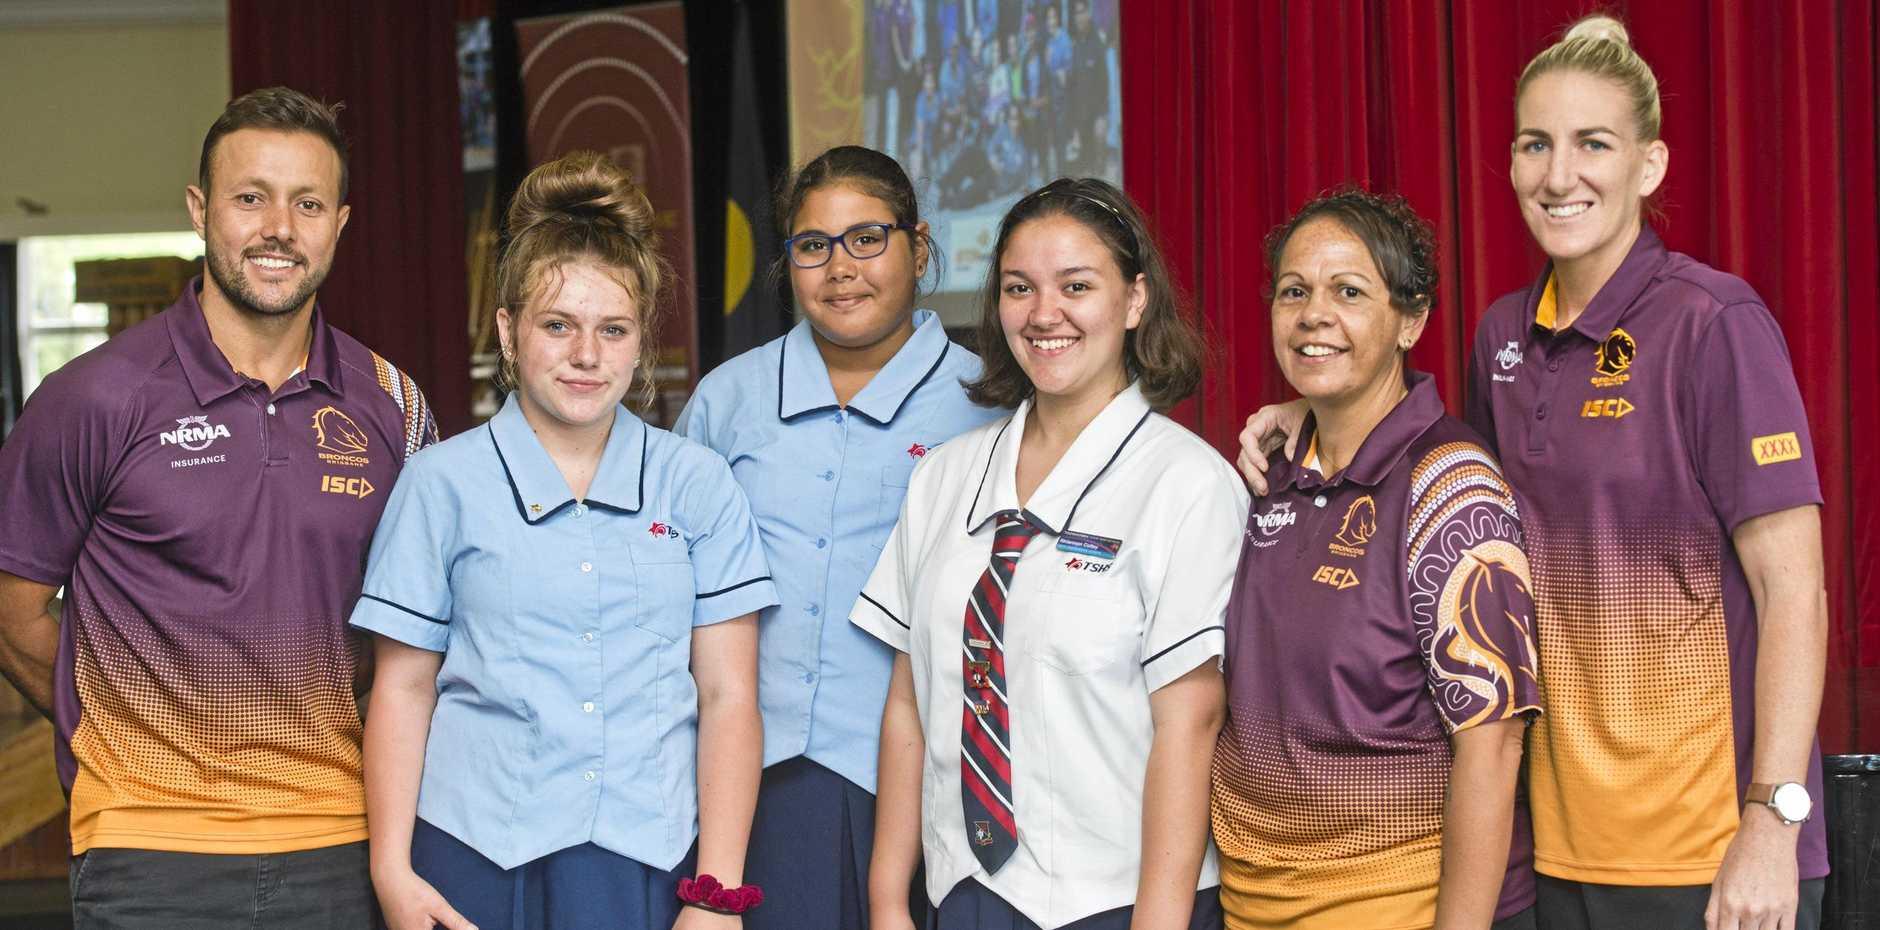 EDUCATIONAL PROGRAM: At the Beyond Broncos Toowoomba State High School program launch are (from left) Scott Prince, Imgale Tuesle, Kirra Gibbs-Hooper, Rhiannon Colley, Liz Wilson and Ali Brigginshaw.